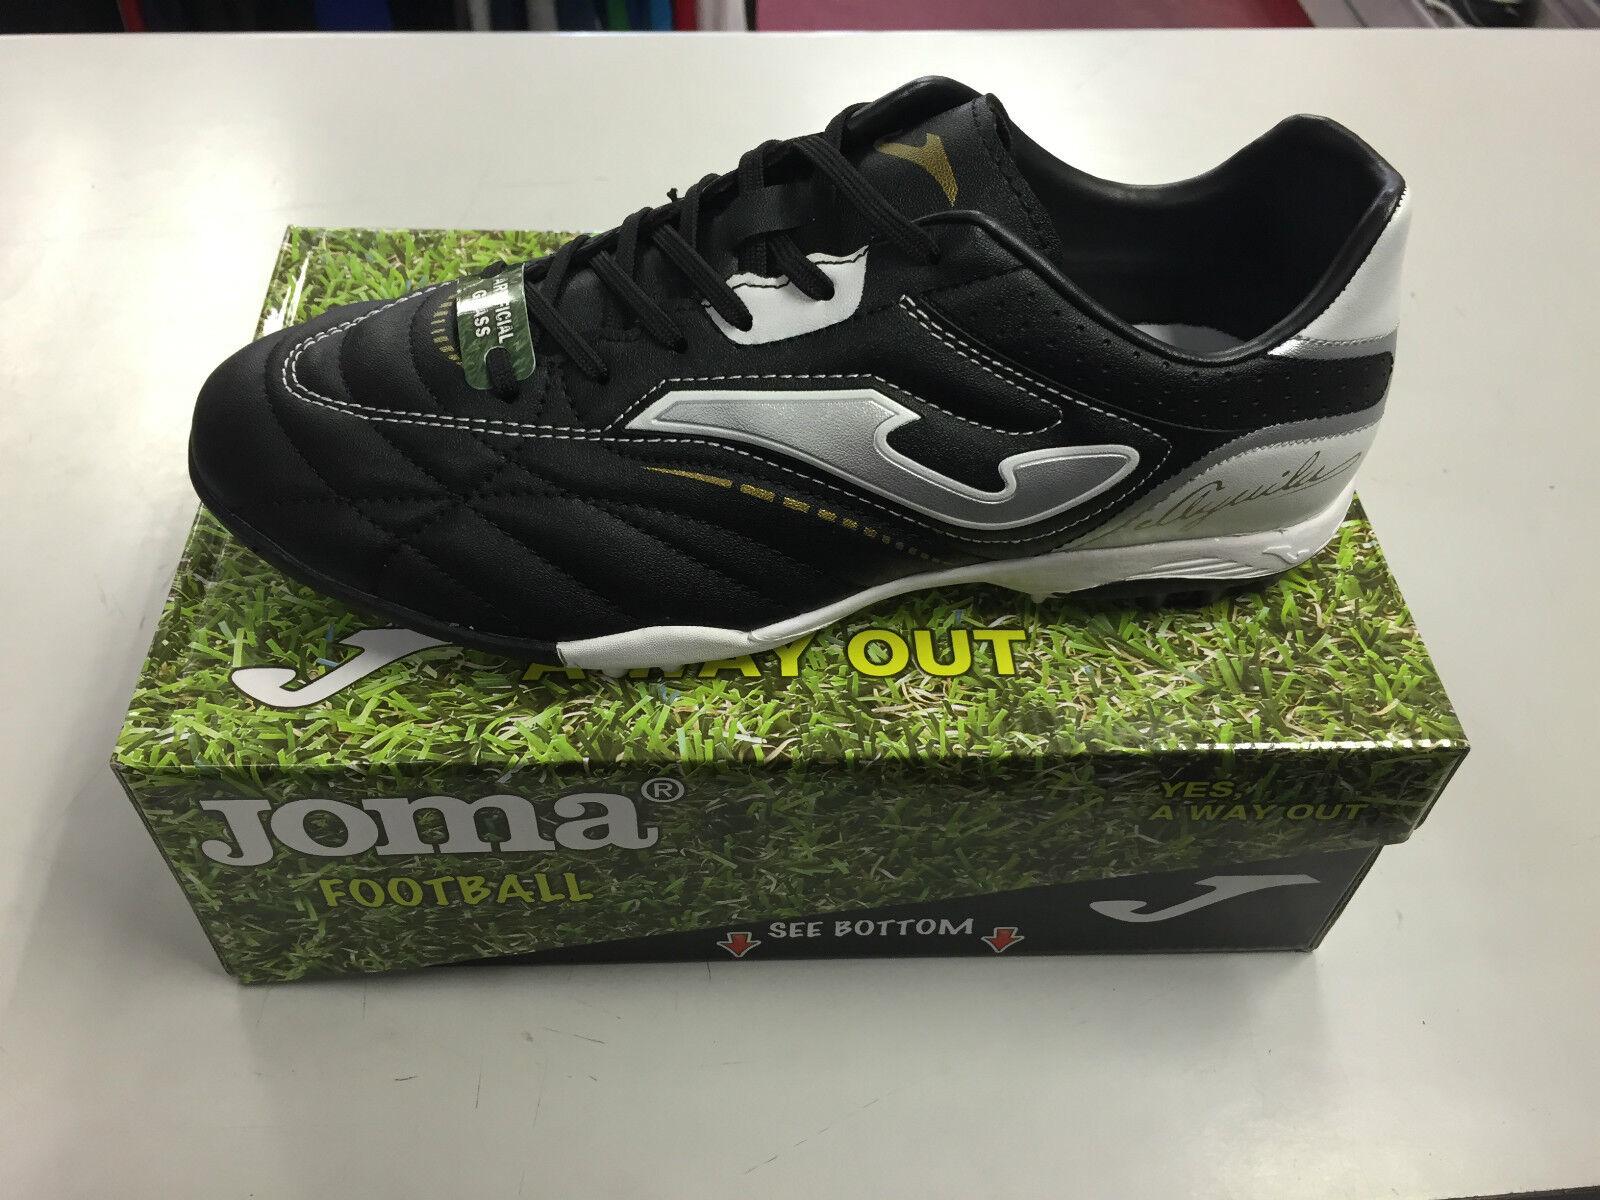 Joma Aguila 501 Astredurf Size 11